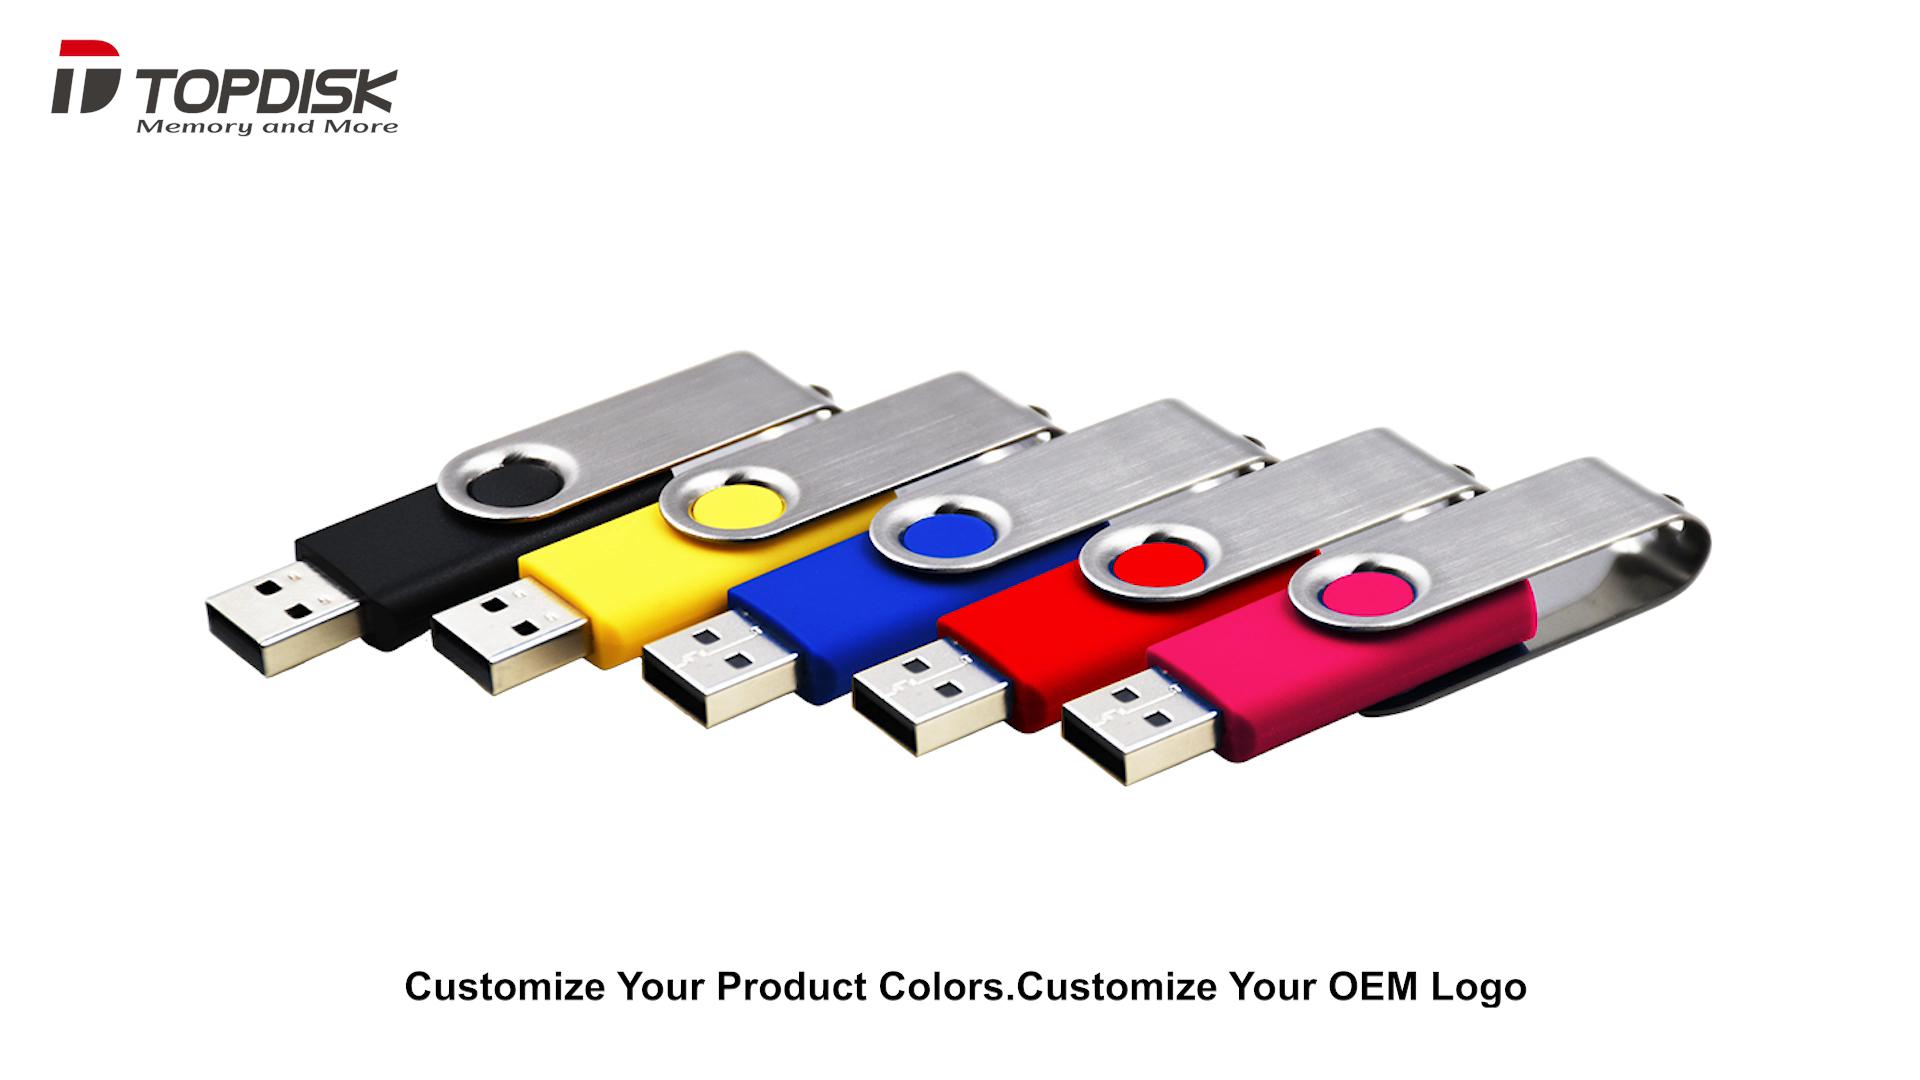 Topdisk Custom 1GB 2GB 4GB 8GB 16GB 32GB 64GB 128GB 256GB 512GB  Memoria  USB Stick Memory Disk Pendrive USB Flash Drive